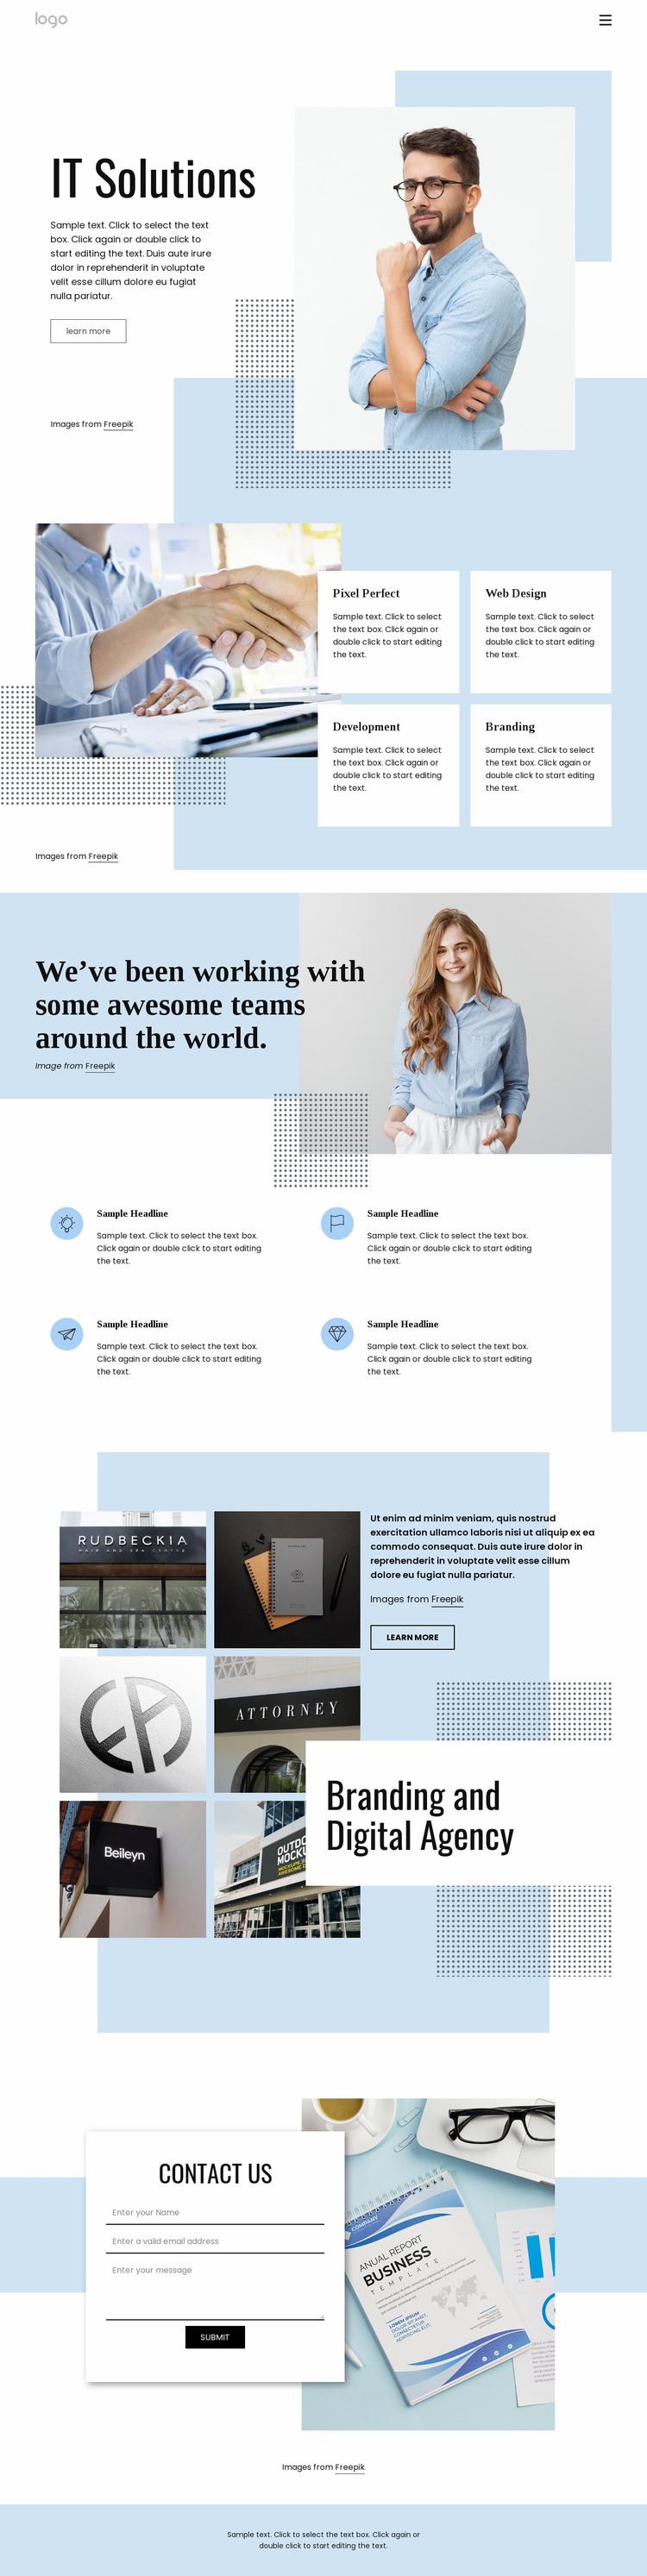 IT software service agency Website Design